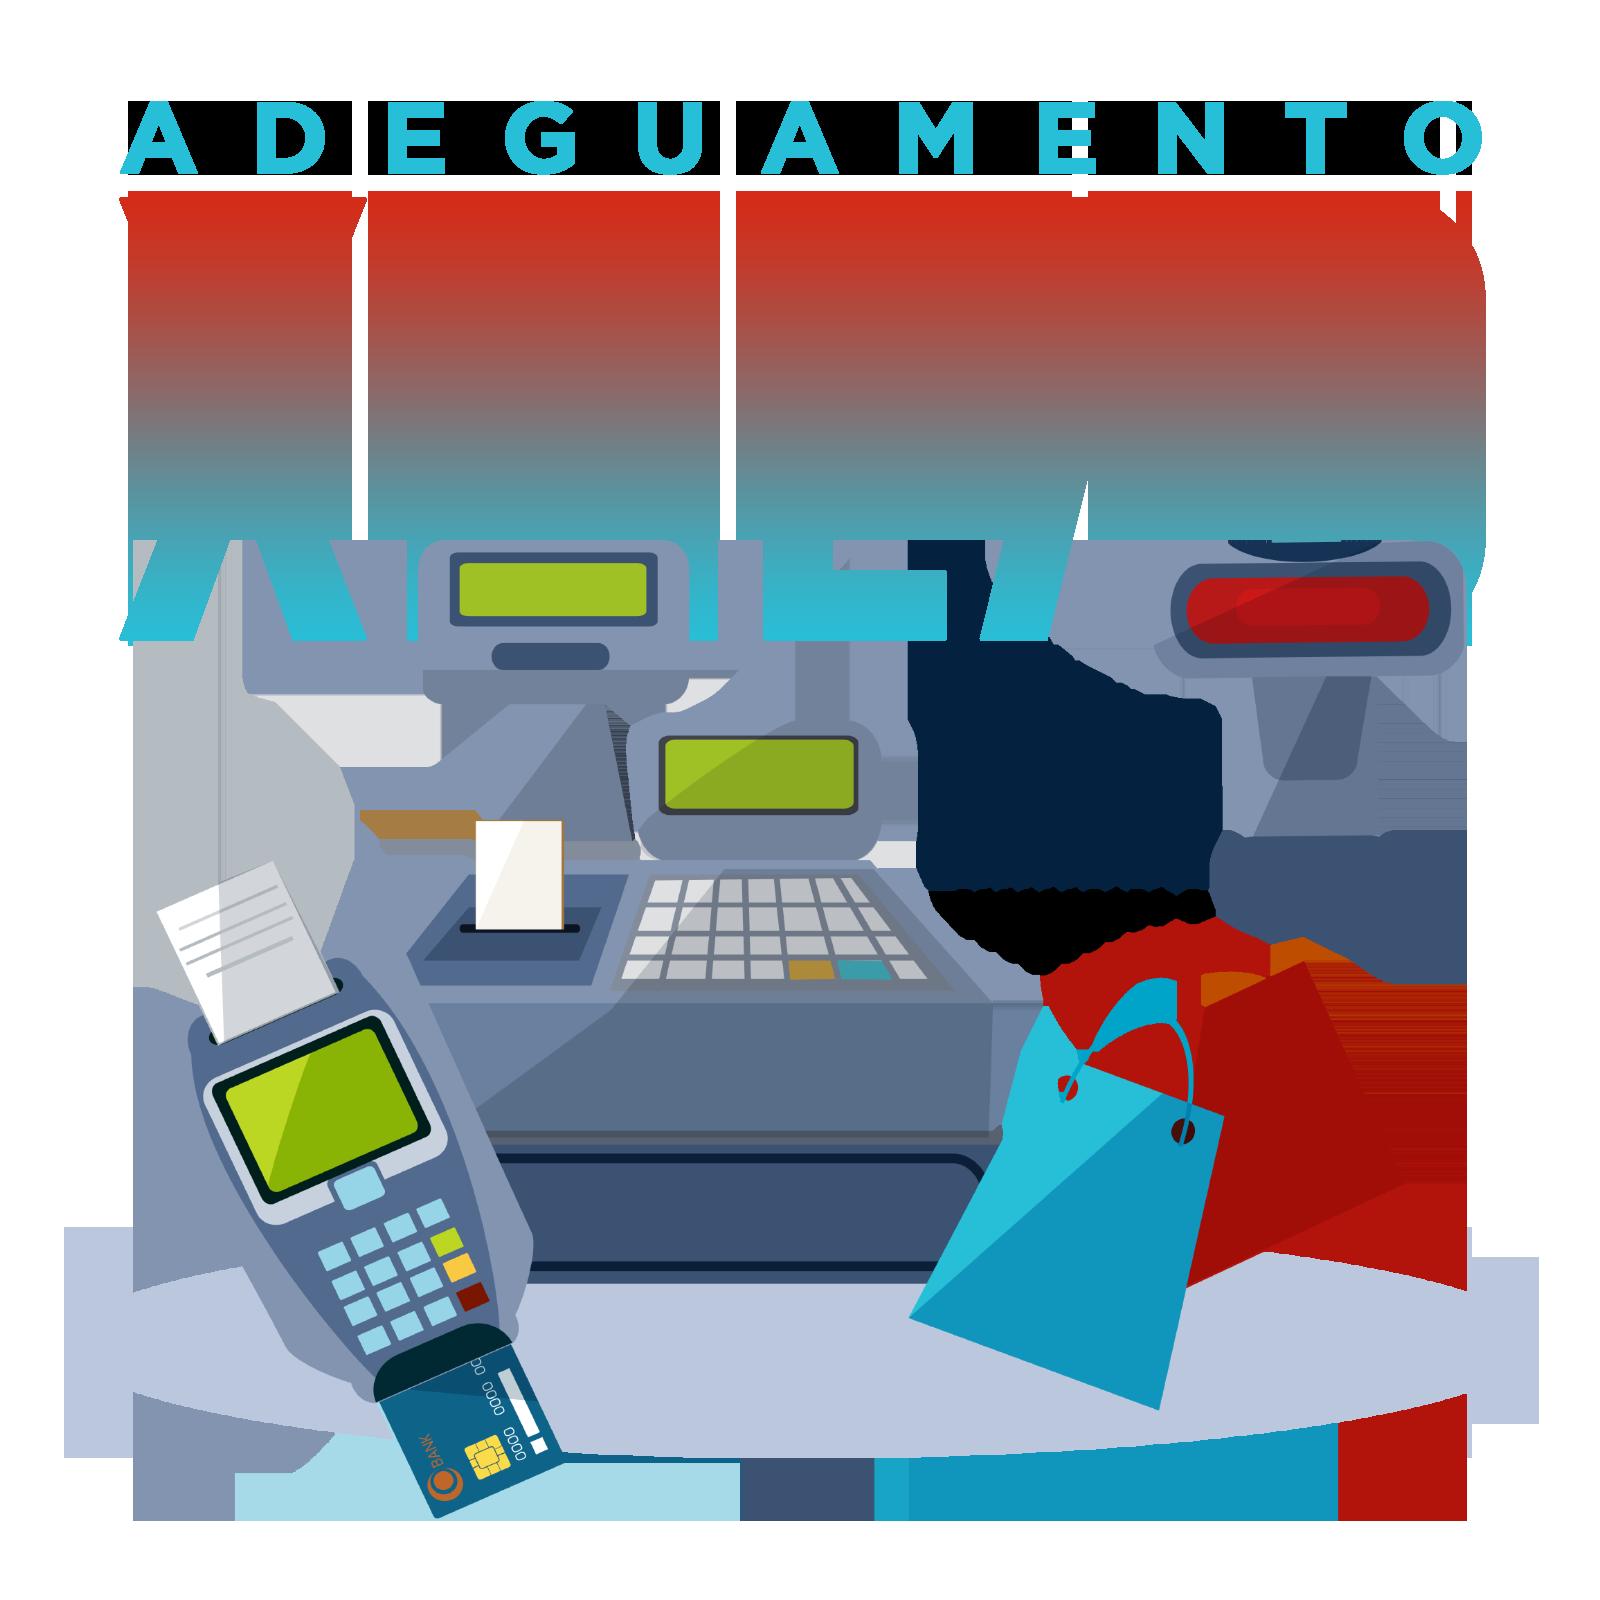 Ceasistemi news adeguamento XML7.0